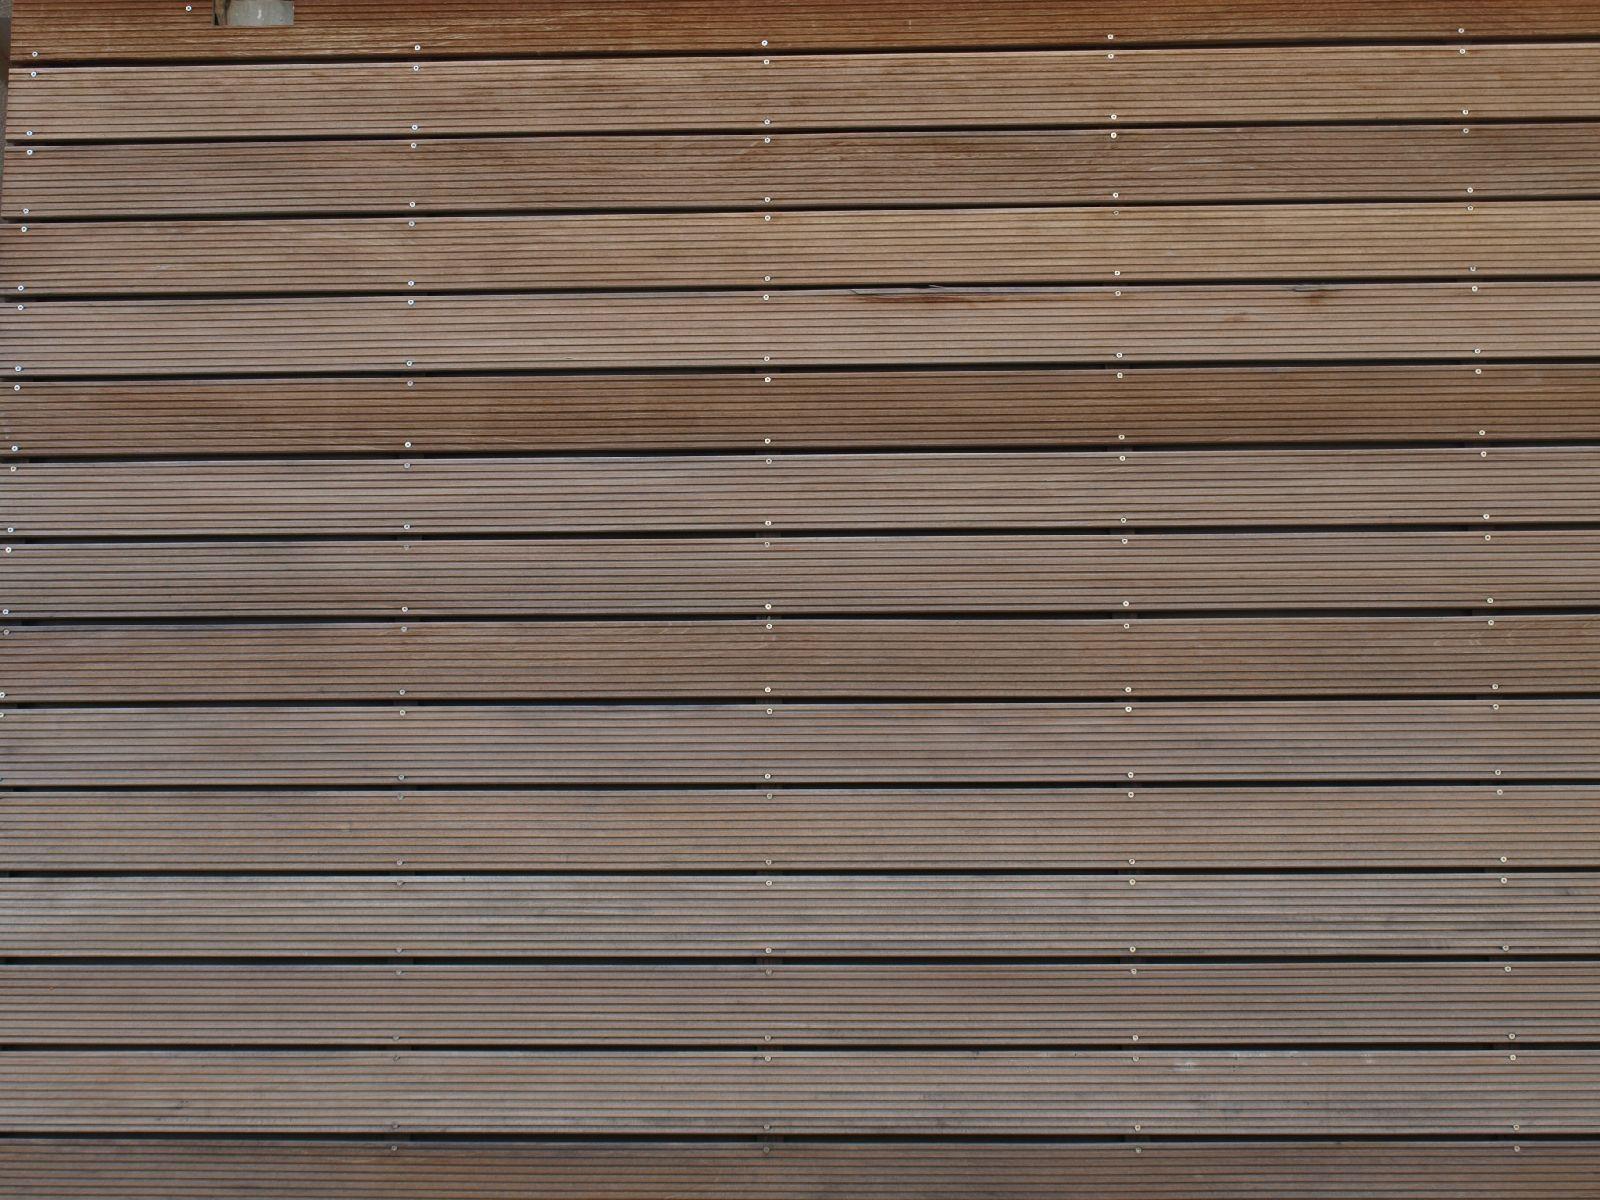 Wood_Texture_A_P7148581